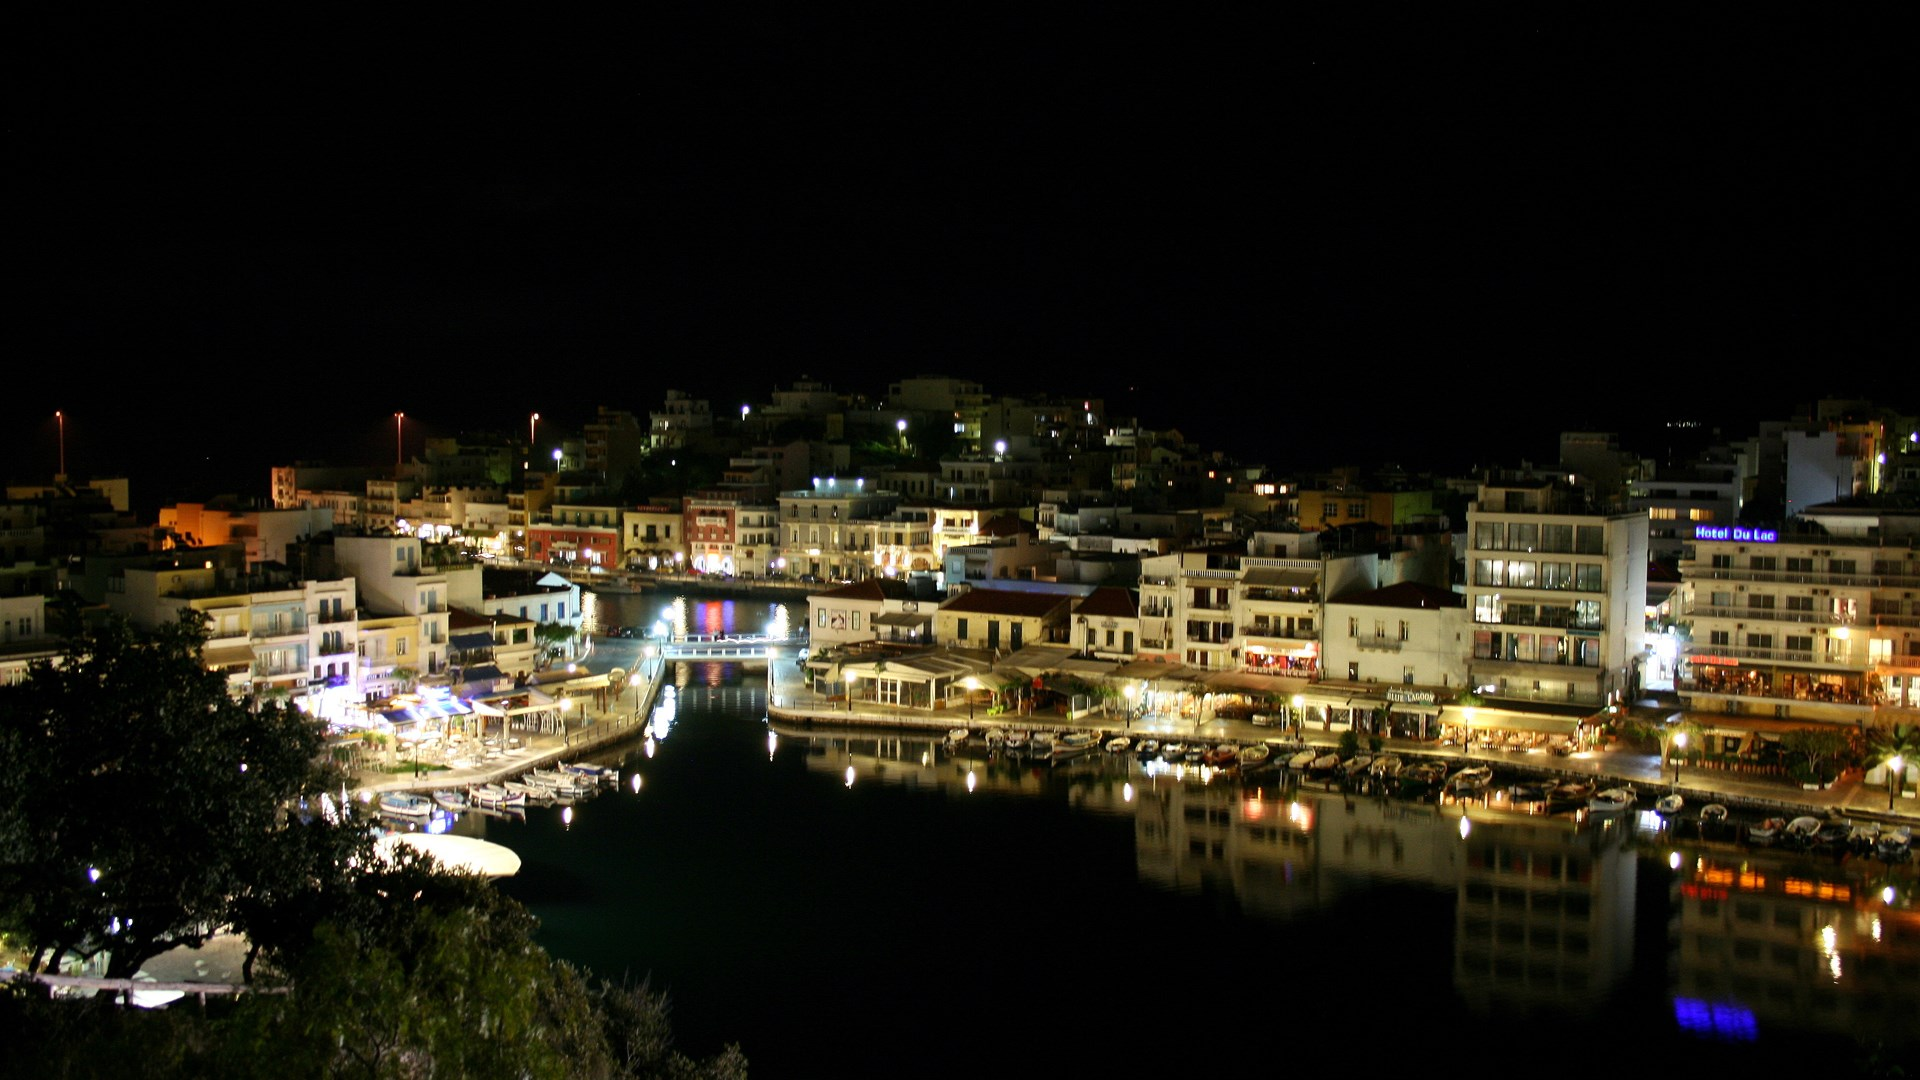 Agios Nikolaos, Crete | 07 Mar 2016 | Alargo